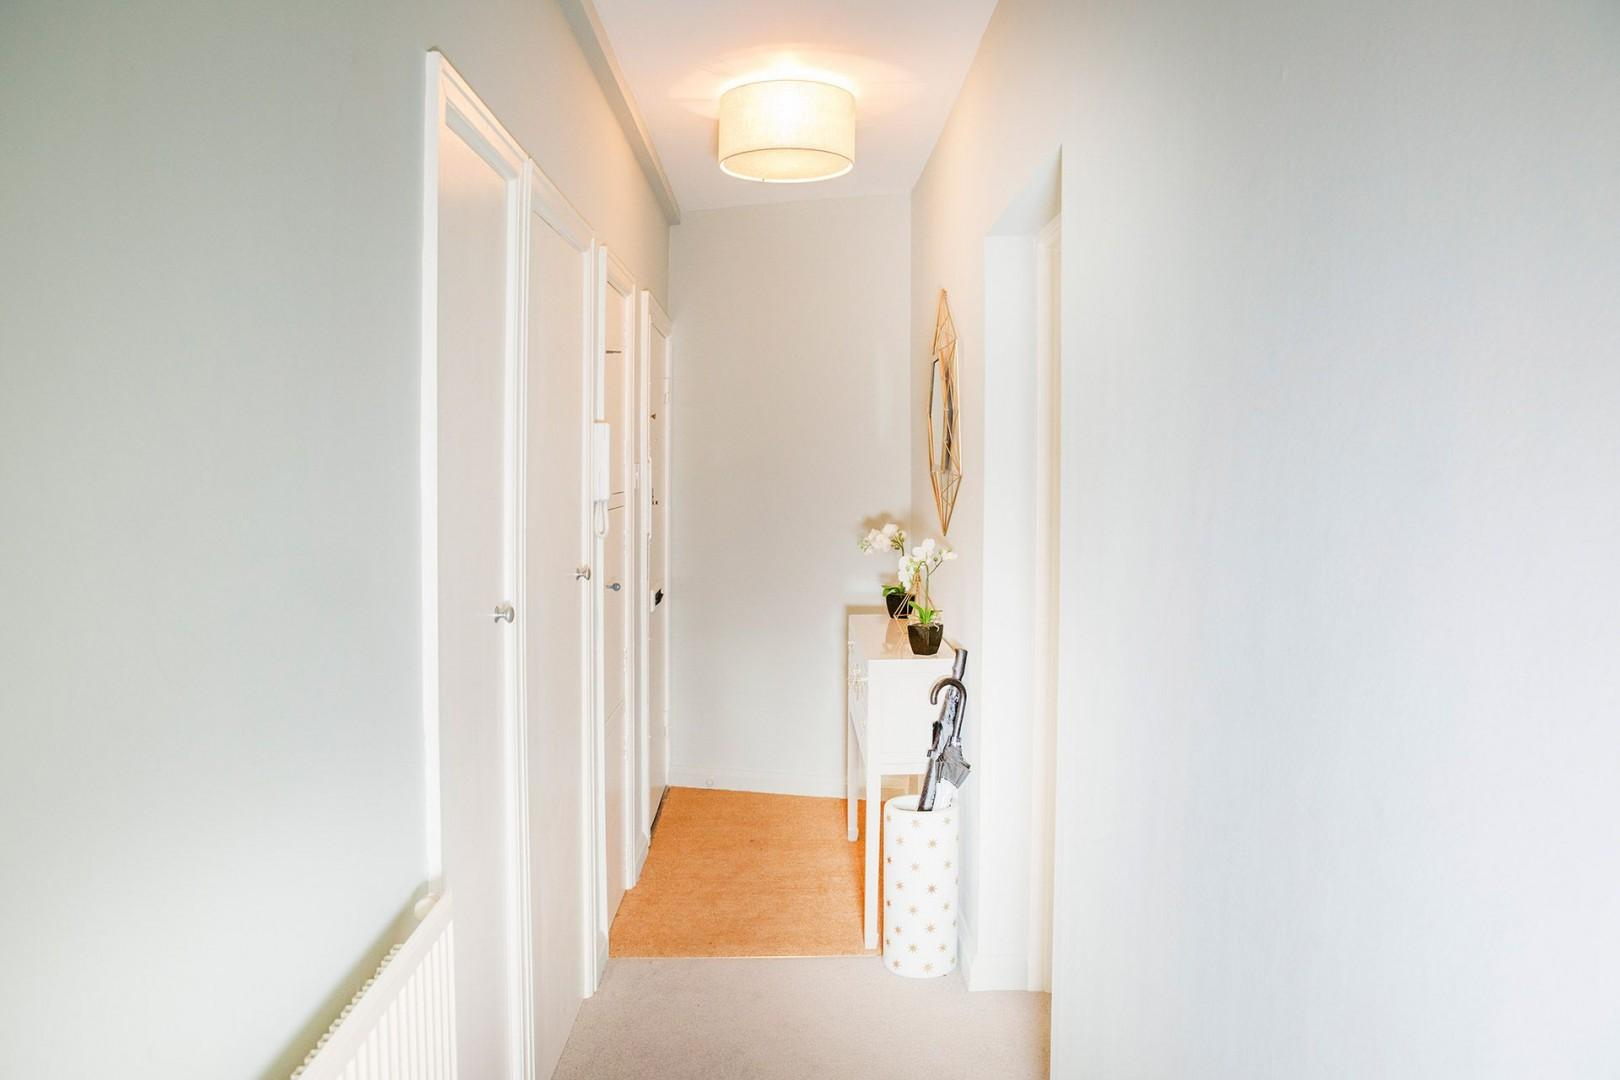 CMS-38-(Entry hall in the Gordon apartment)-15717428-1509433775-Gordon-7070